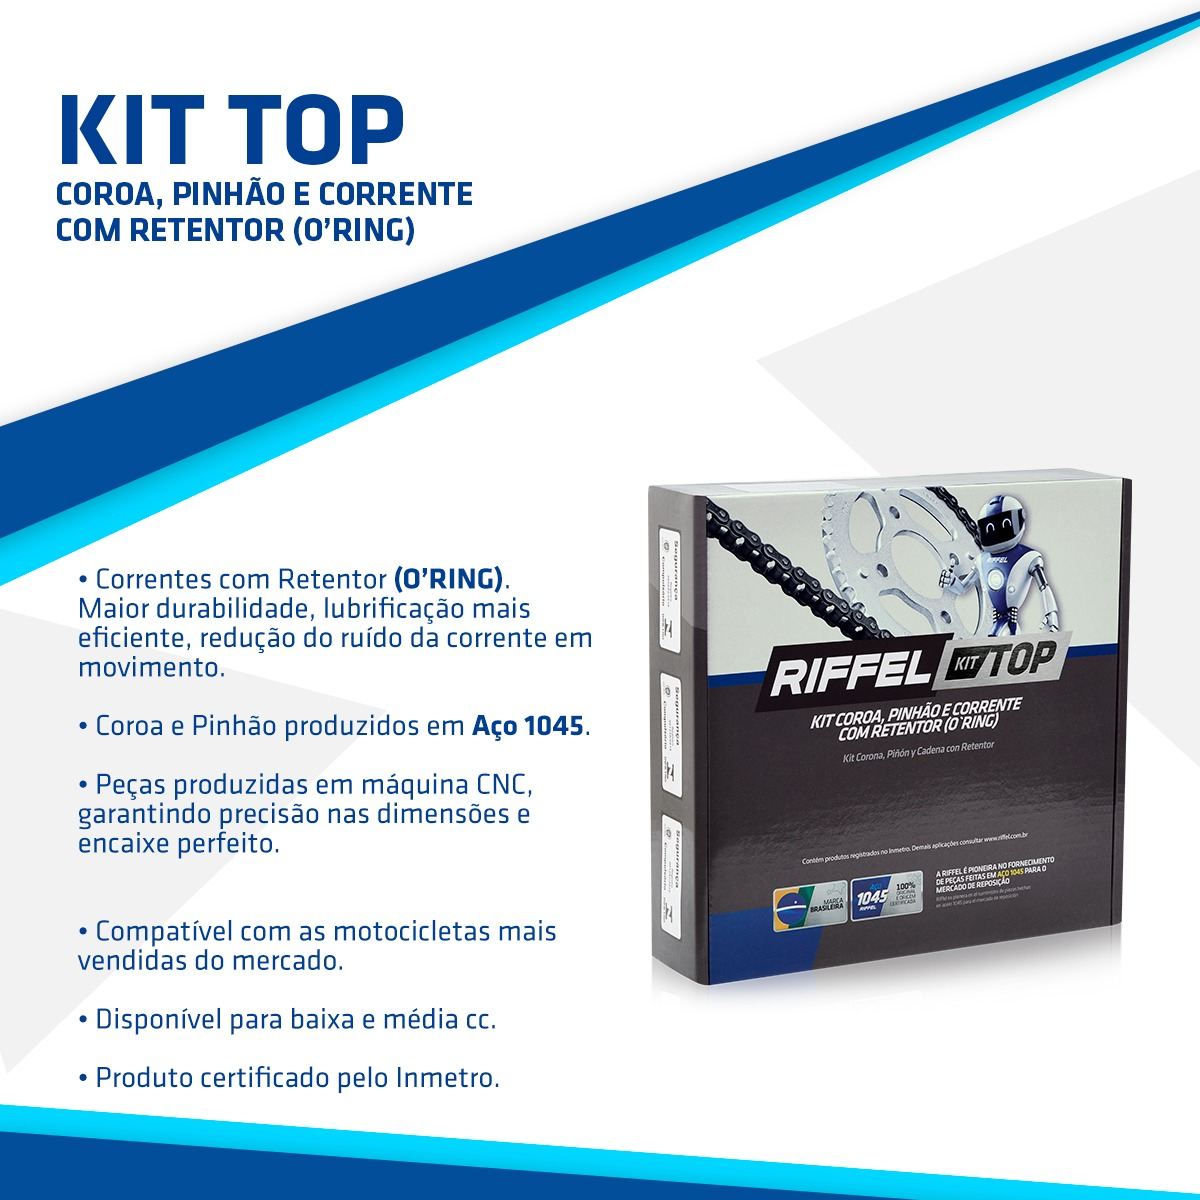 KIT Relação Transmissão CG 125 TITAN ES/KS C/ ANEL 44Z X 14Z (71790) C/ CORRENTE O'RING 428HO X 116L - TOP (1045)